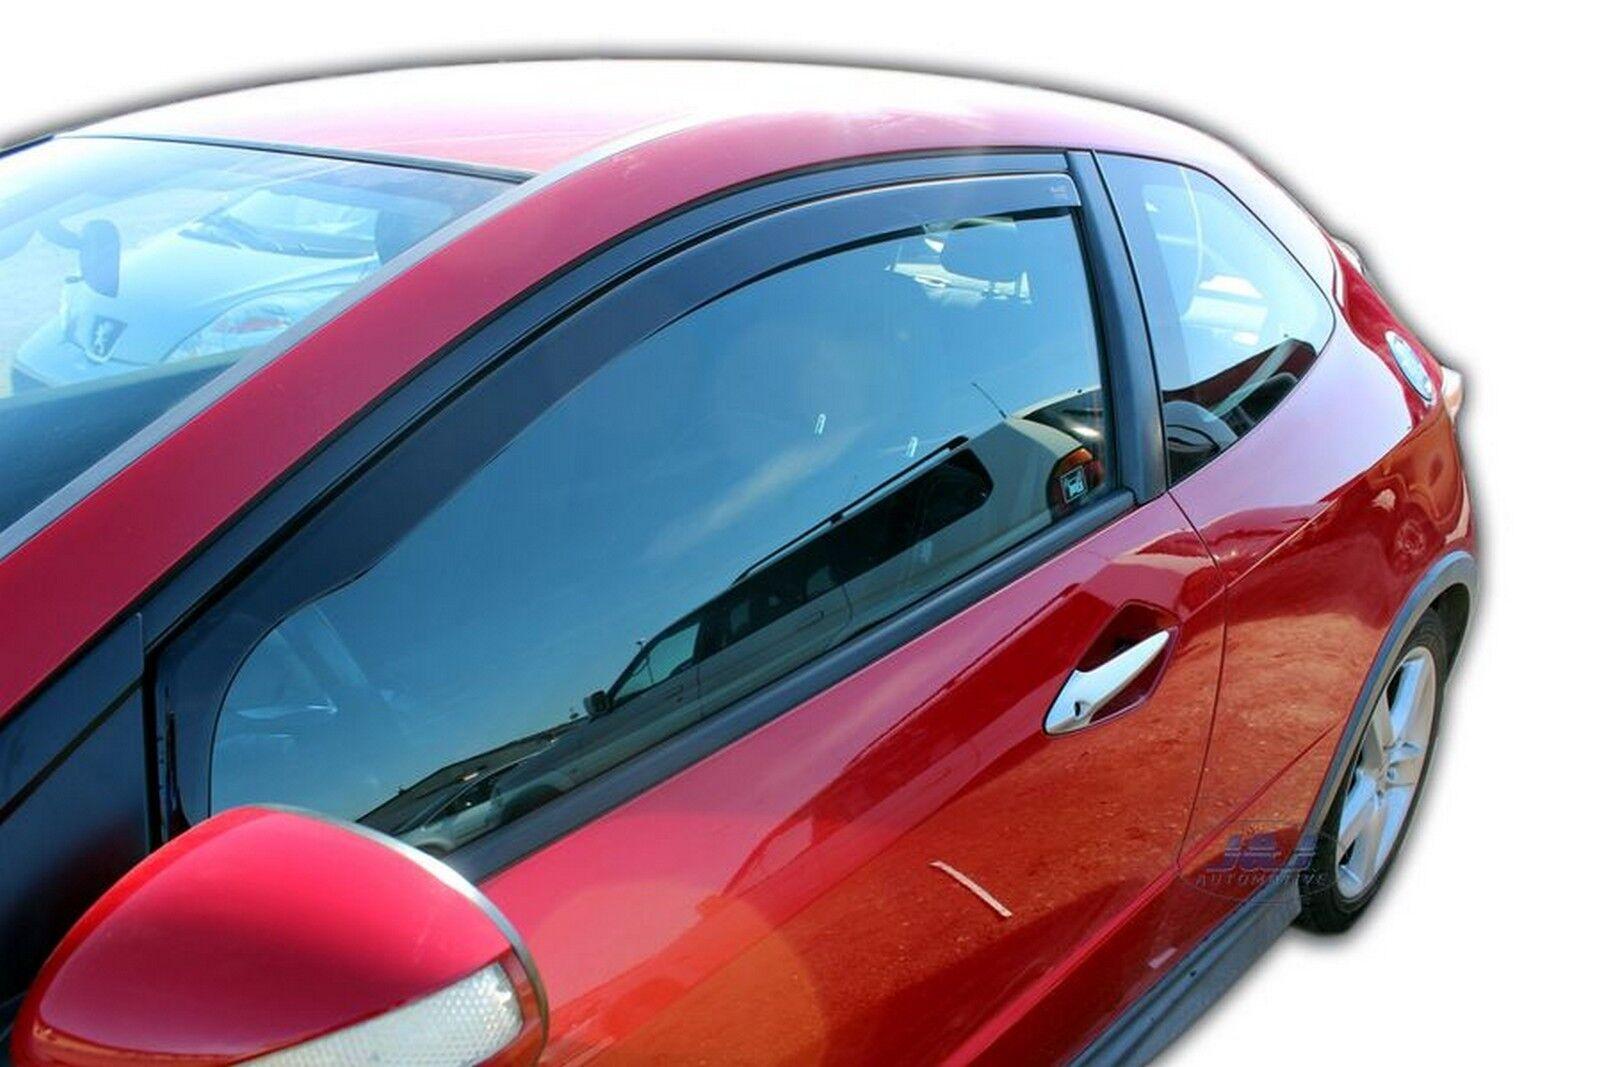 Peugeot 206 1998 2006 3 Doors Wind Deflector 2 Pcs Heko 26115 Ebay Fuse Box Buzzing Norton Secured Powered By Verisign